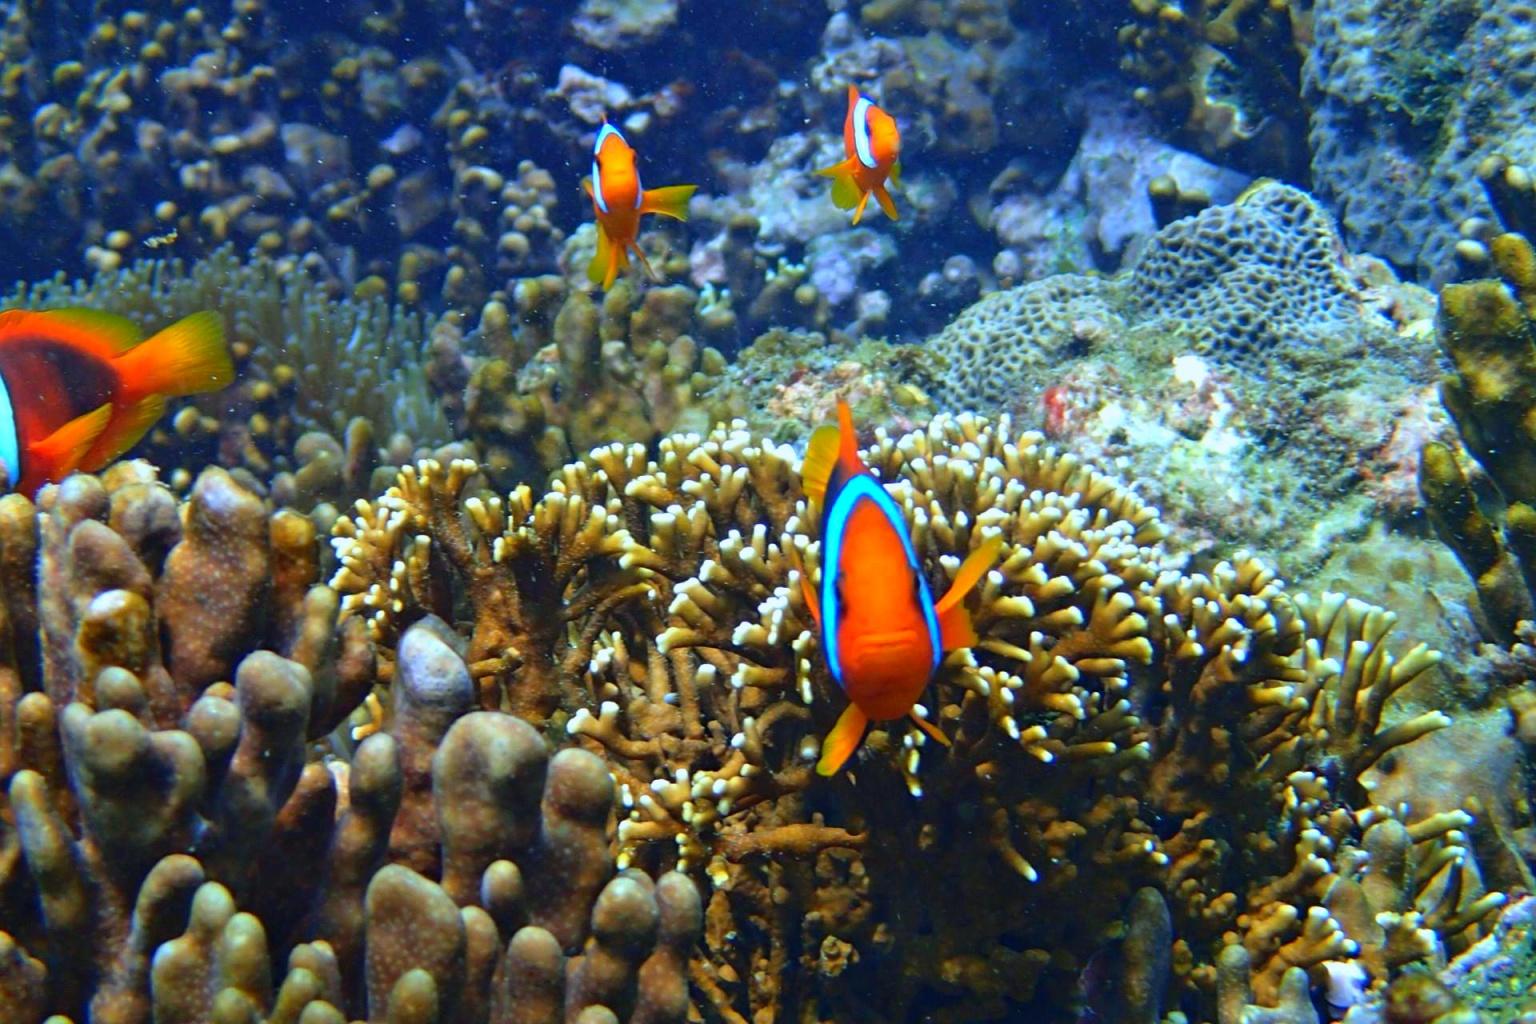 fish.jpg (521 KB)